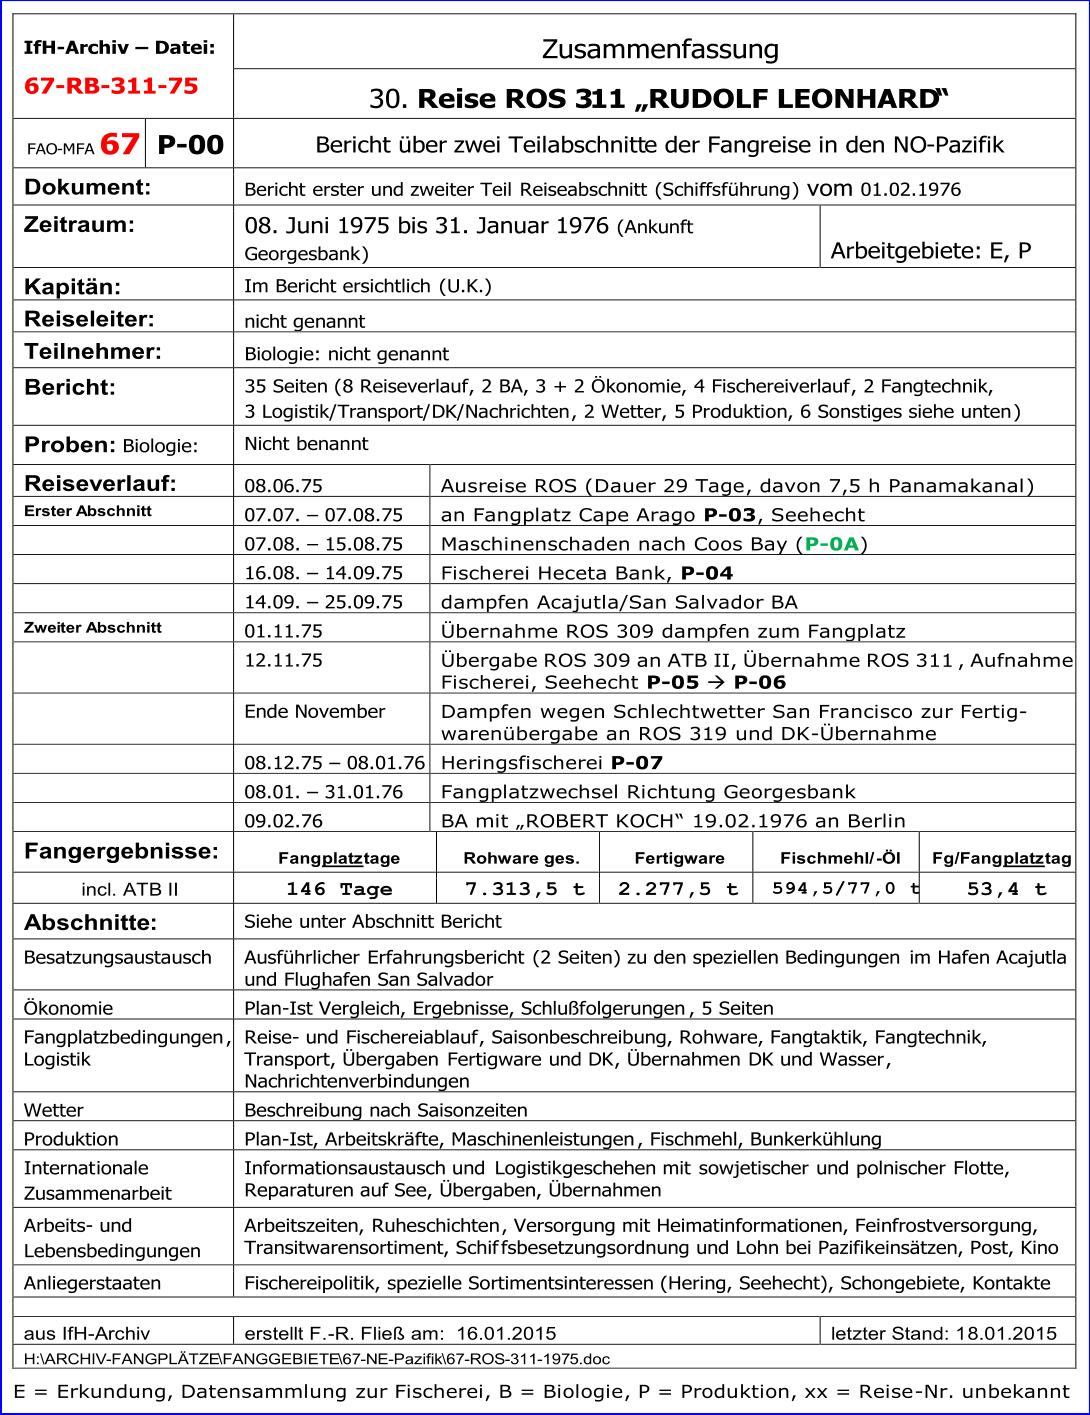 Ifh archiv date i 67 rb 311 75 z usammenfassung for Koch 1 lehrjahr lohn